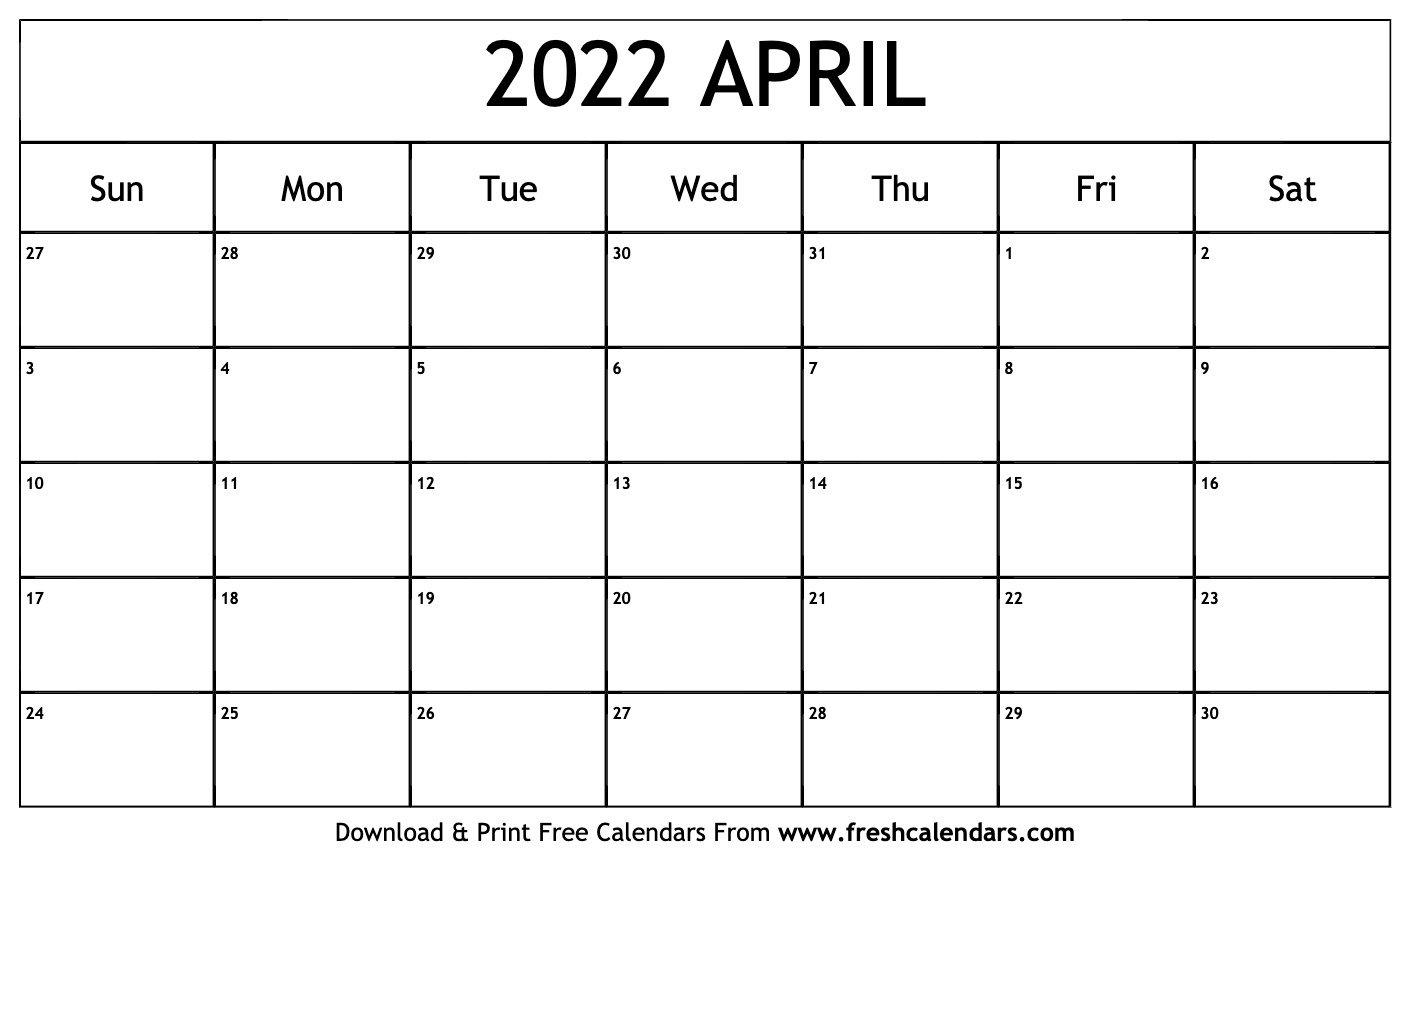 Blank Printable April 2022 Calendars within April May 2022 Printable Calendar